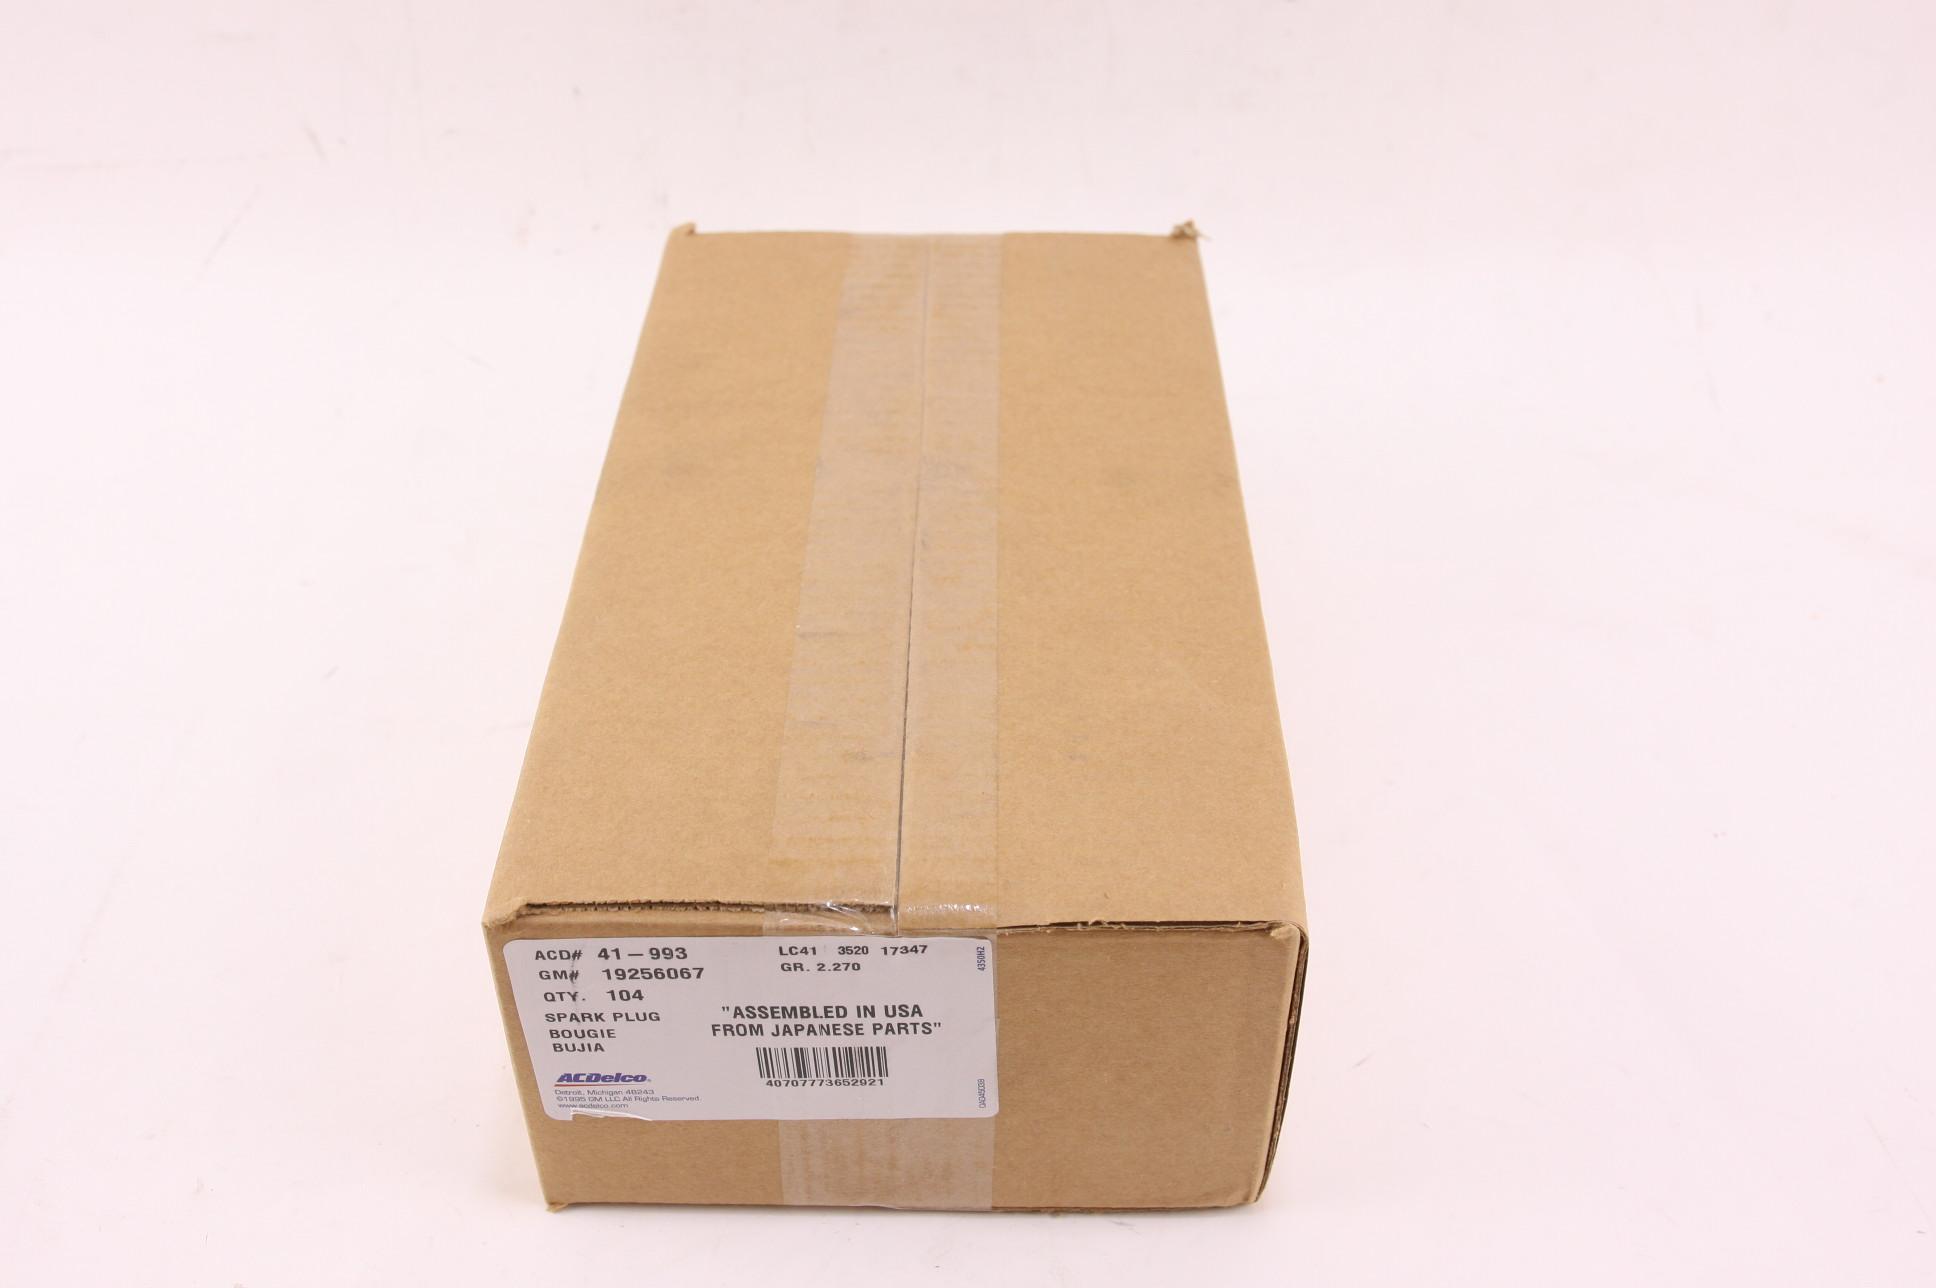 New ACDelco Professional 41-993 GM 19256067 IRIDIUM Spark Plugs Case Pack of 104 - image 10